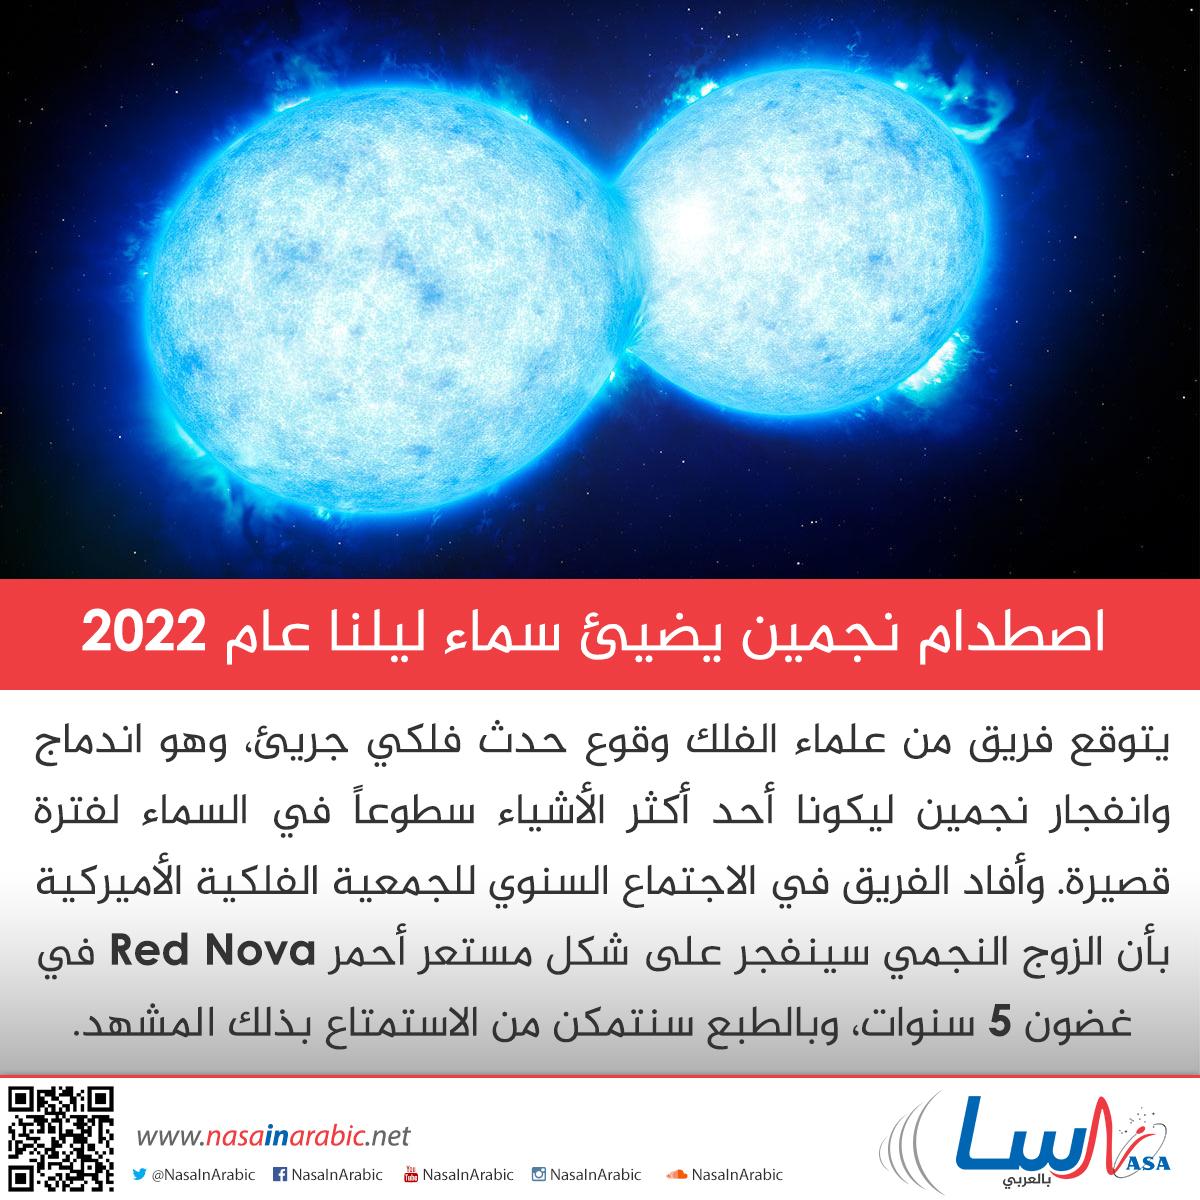 اصطدام نجمين يضيئ سماء ليلنا عام 2022